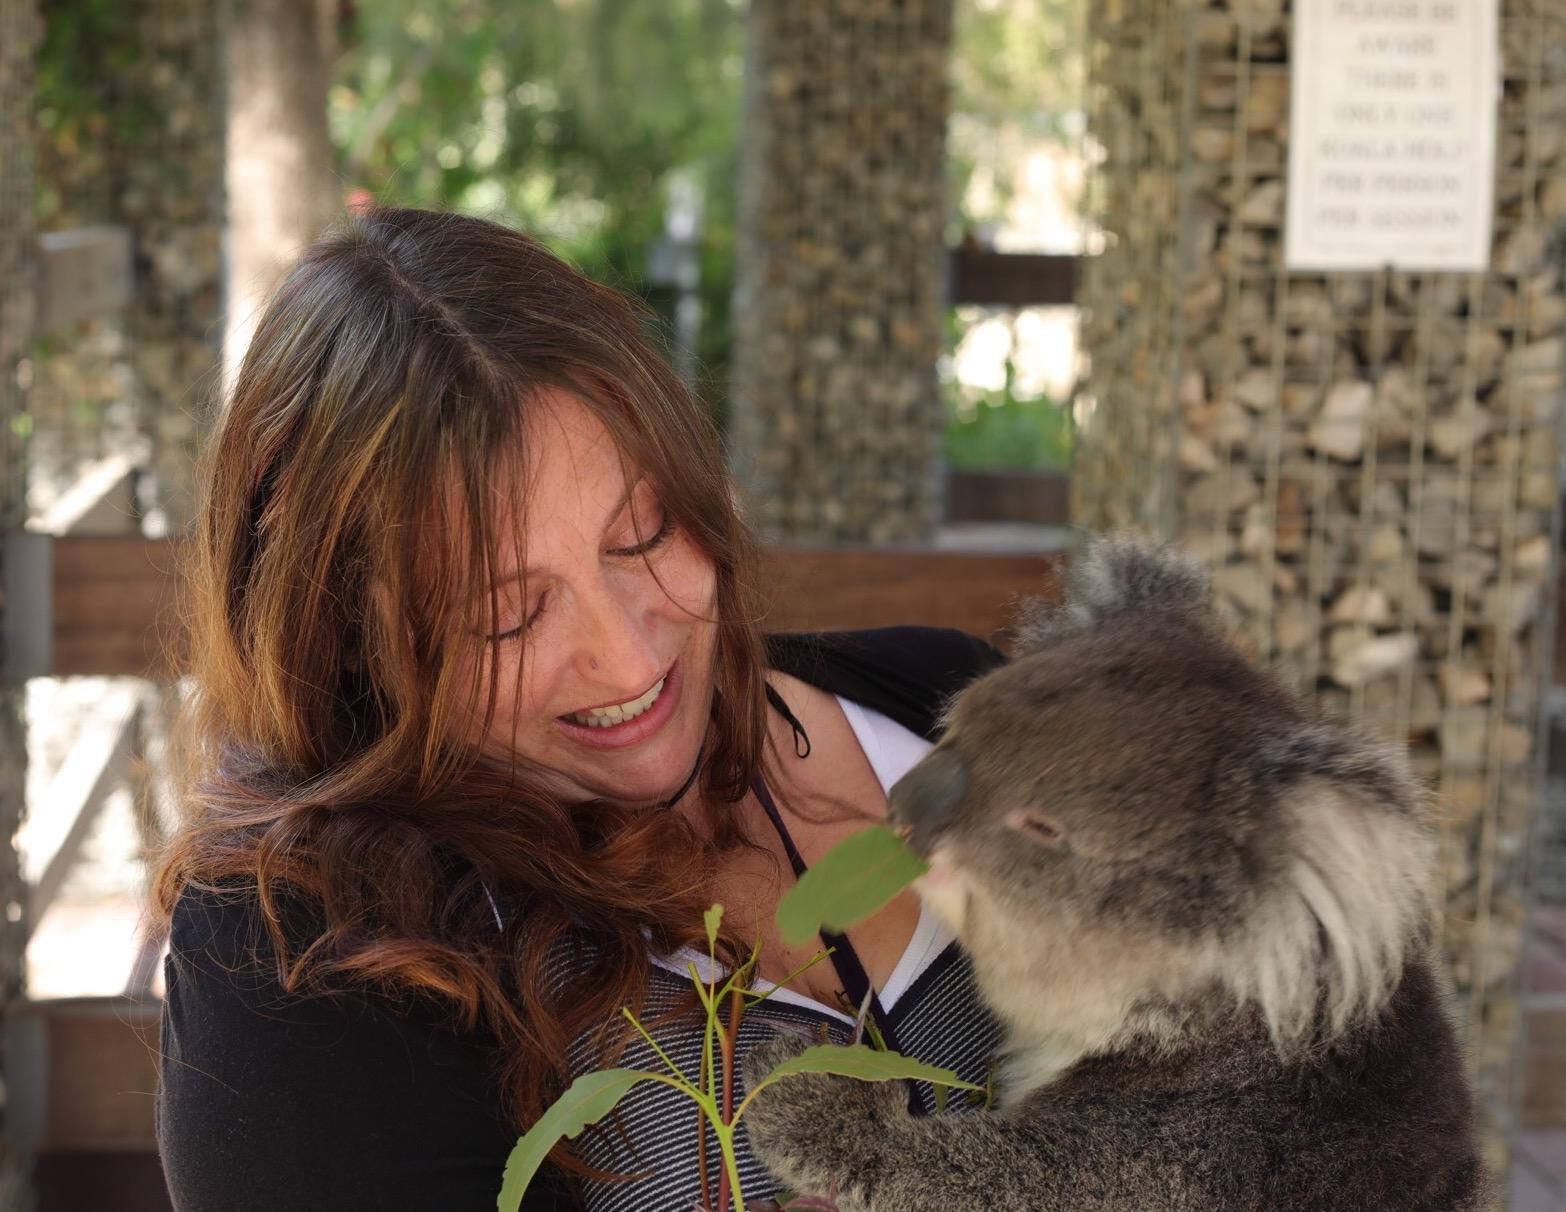 Cuddling Bella the koala :)